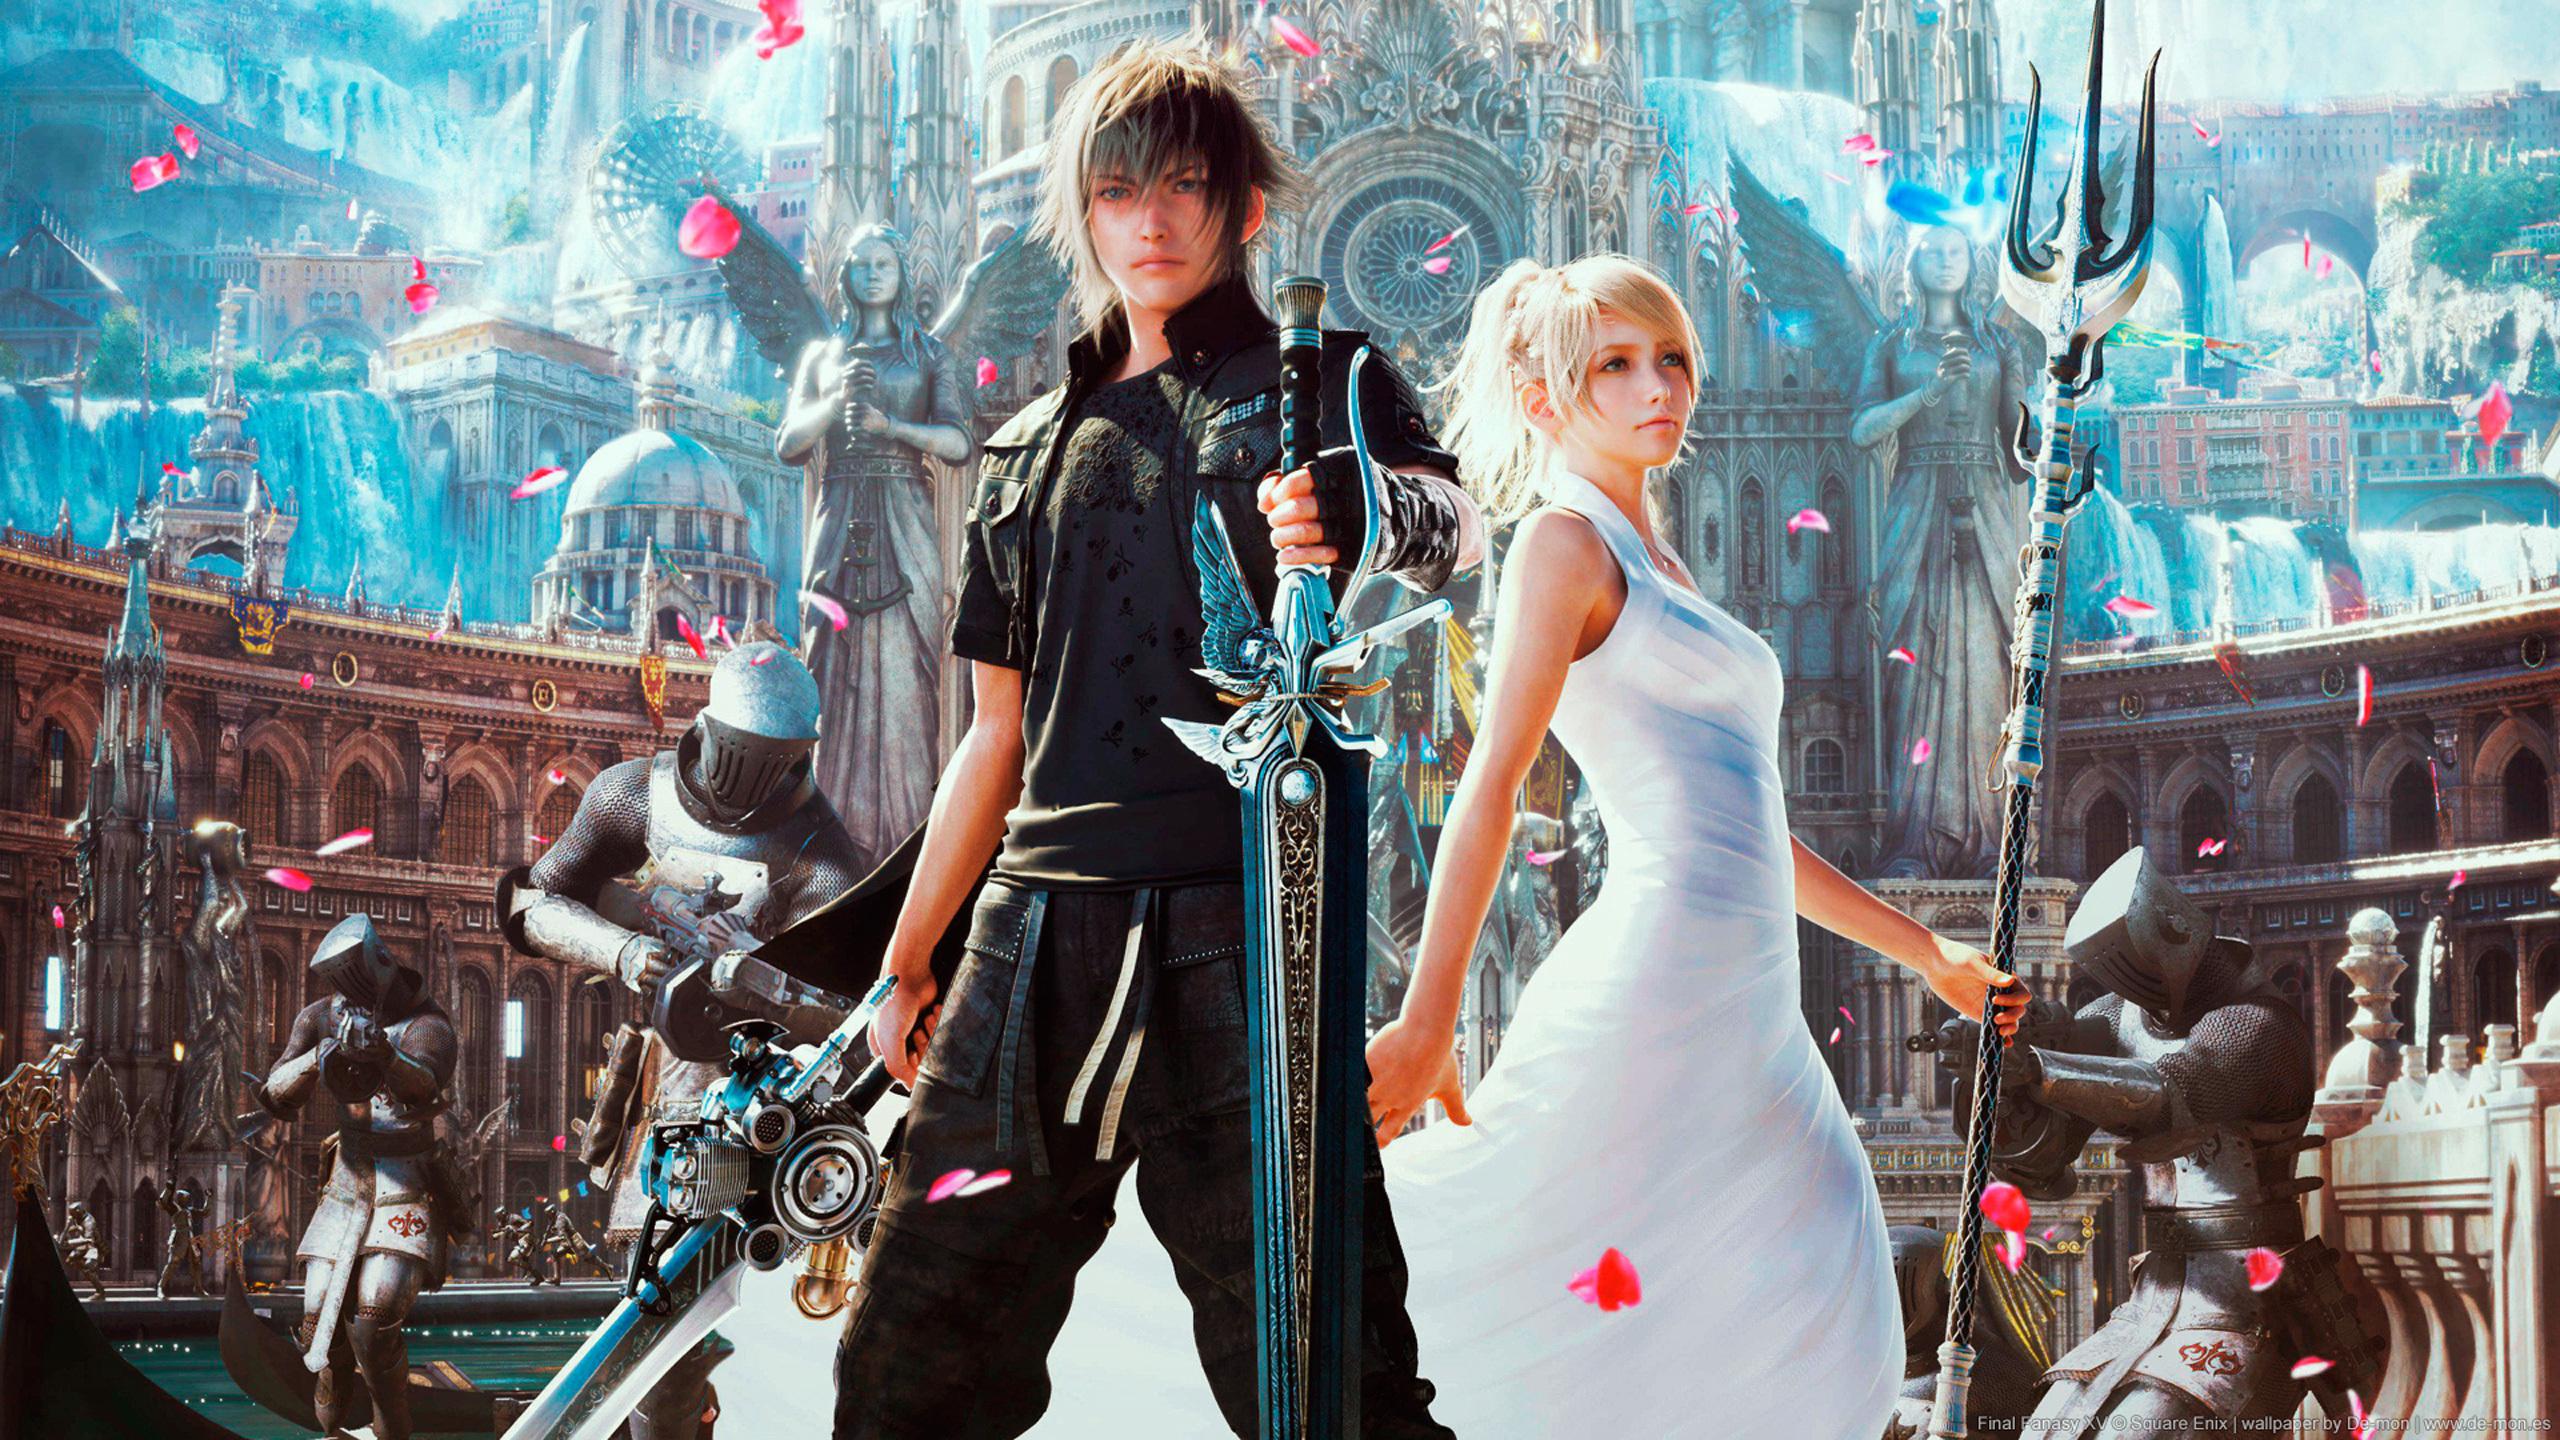 Final fantasy xv artwork h5 jpg